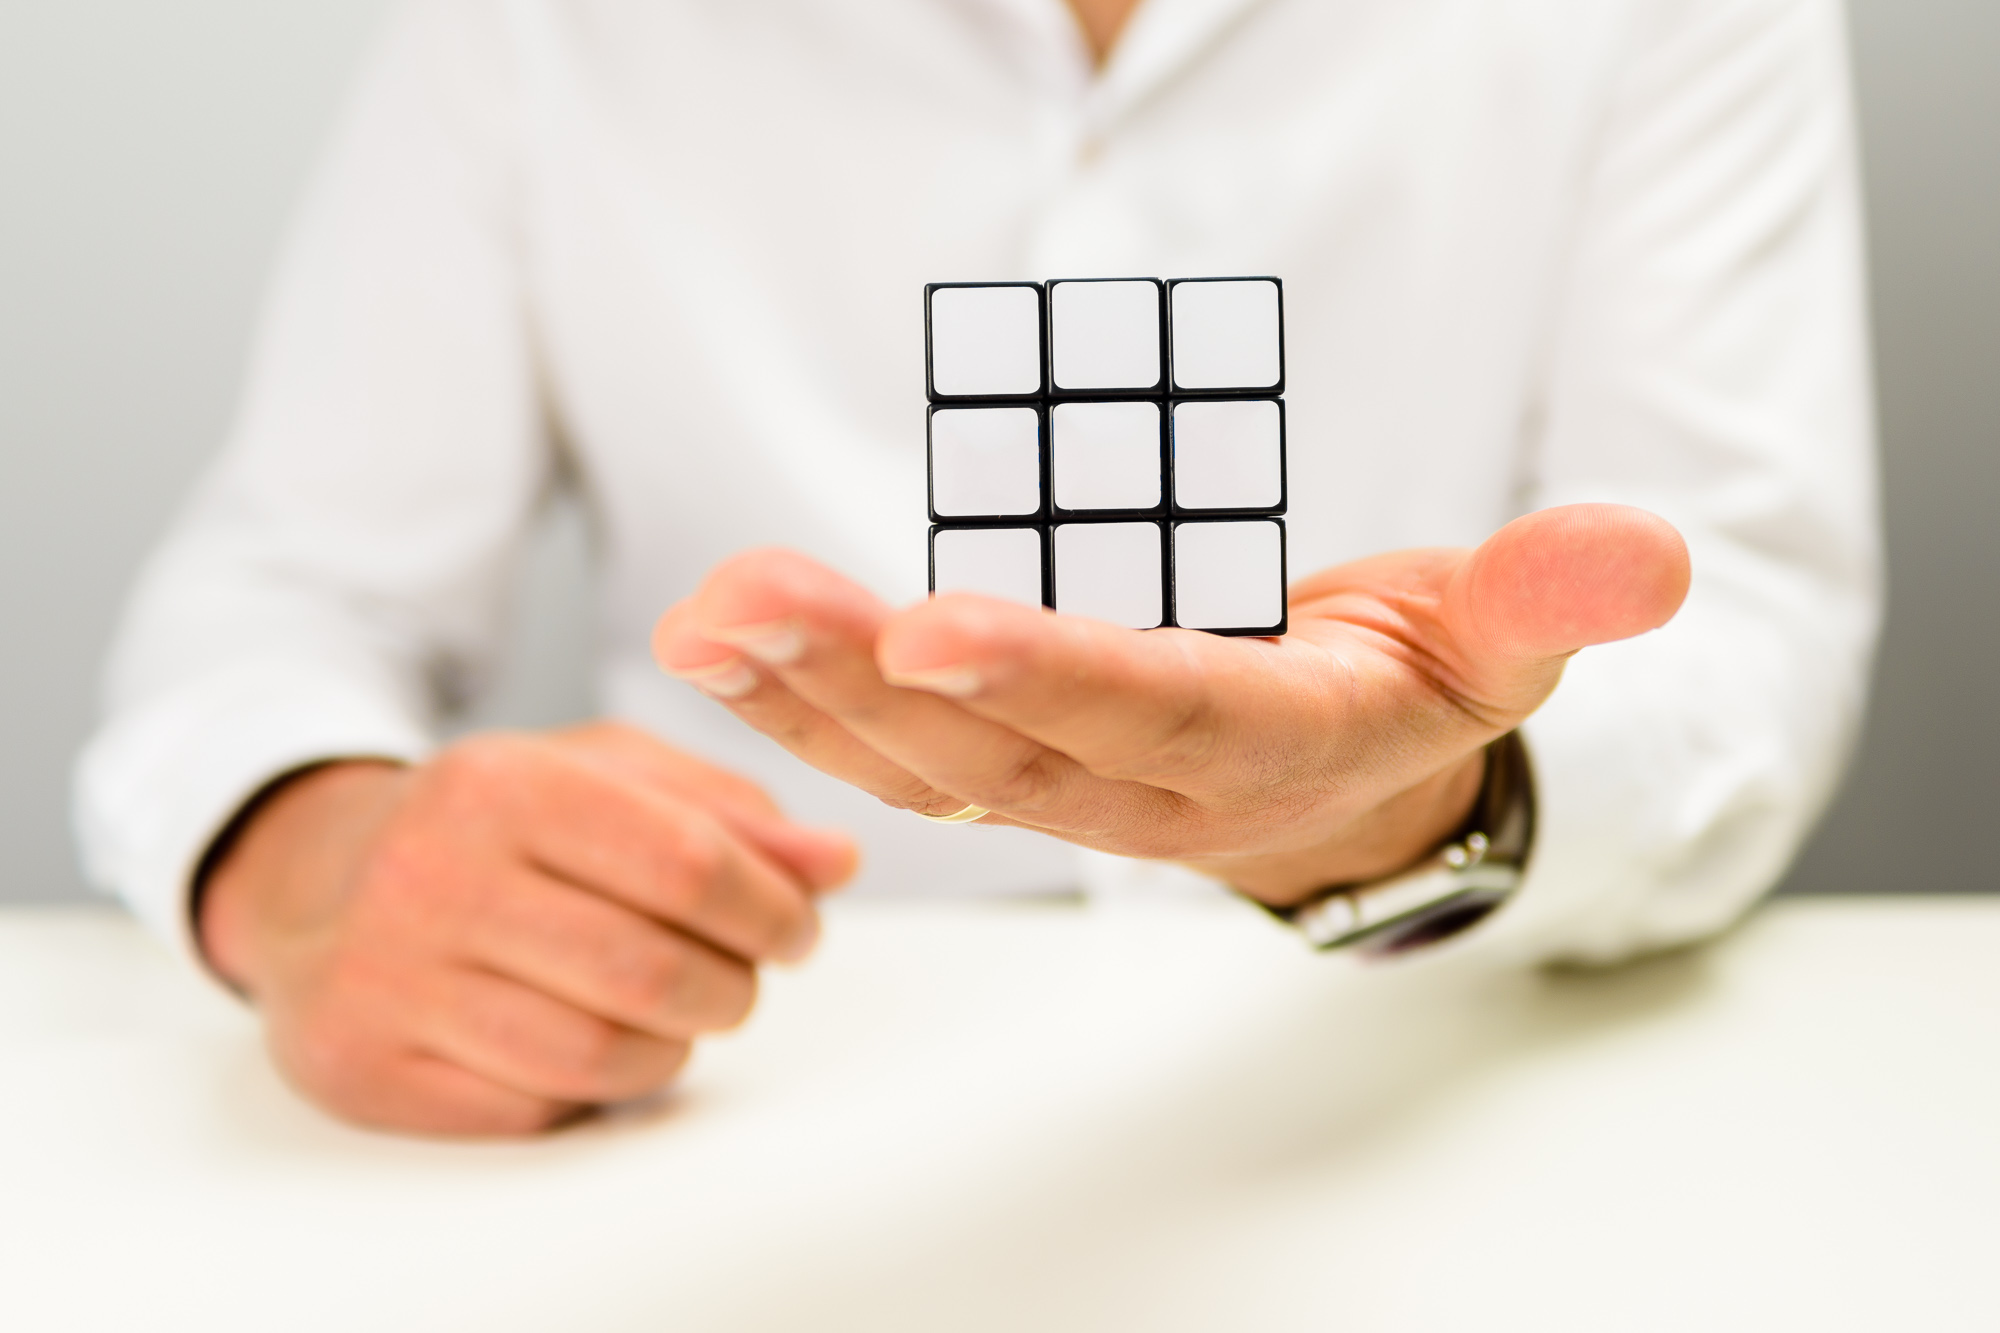 Idio Rubiks Cube stills-011-Edit WEB QUALITY.jpg